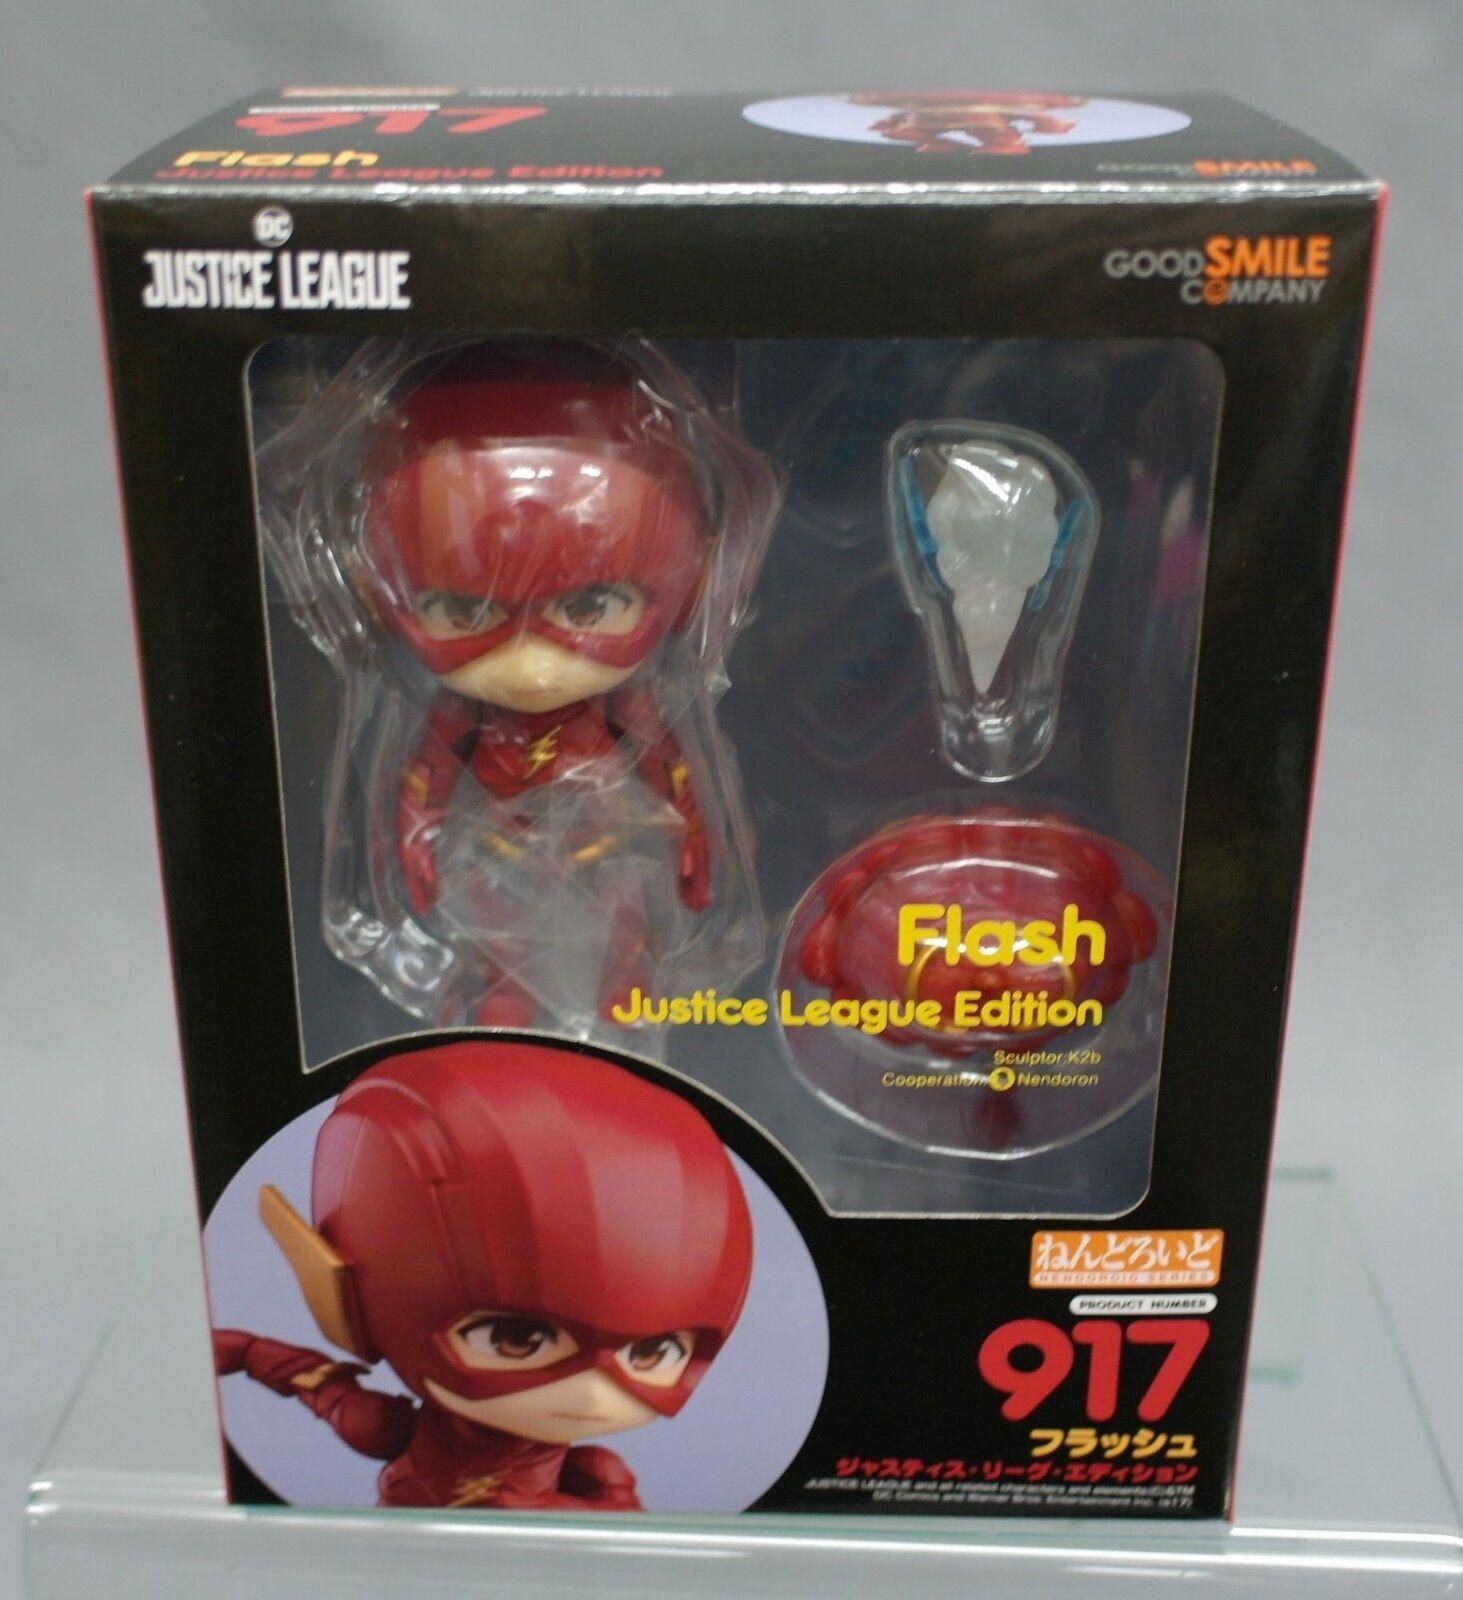 Nendoroid Flash Justice League Edition Good Smile Company Japan New